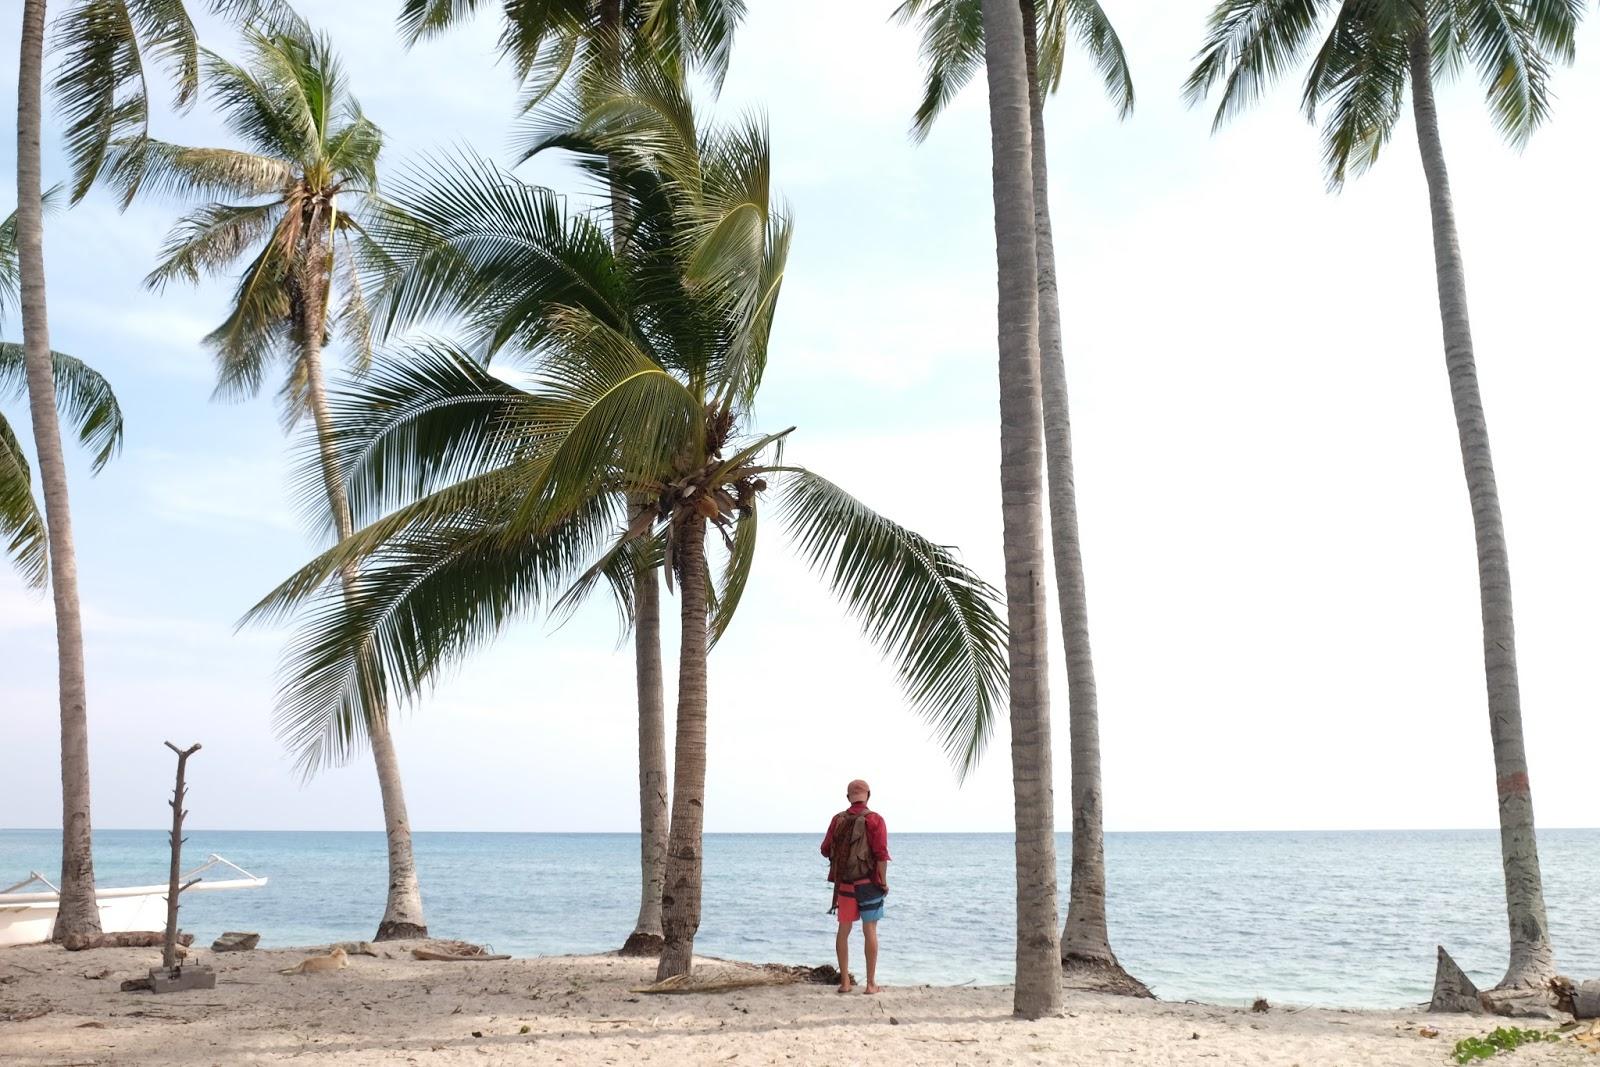 Pantai Palippis Keren Sulbar Mulai Tenar Kembali Teduh Banget Pohon